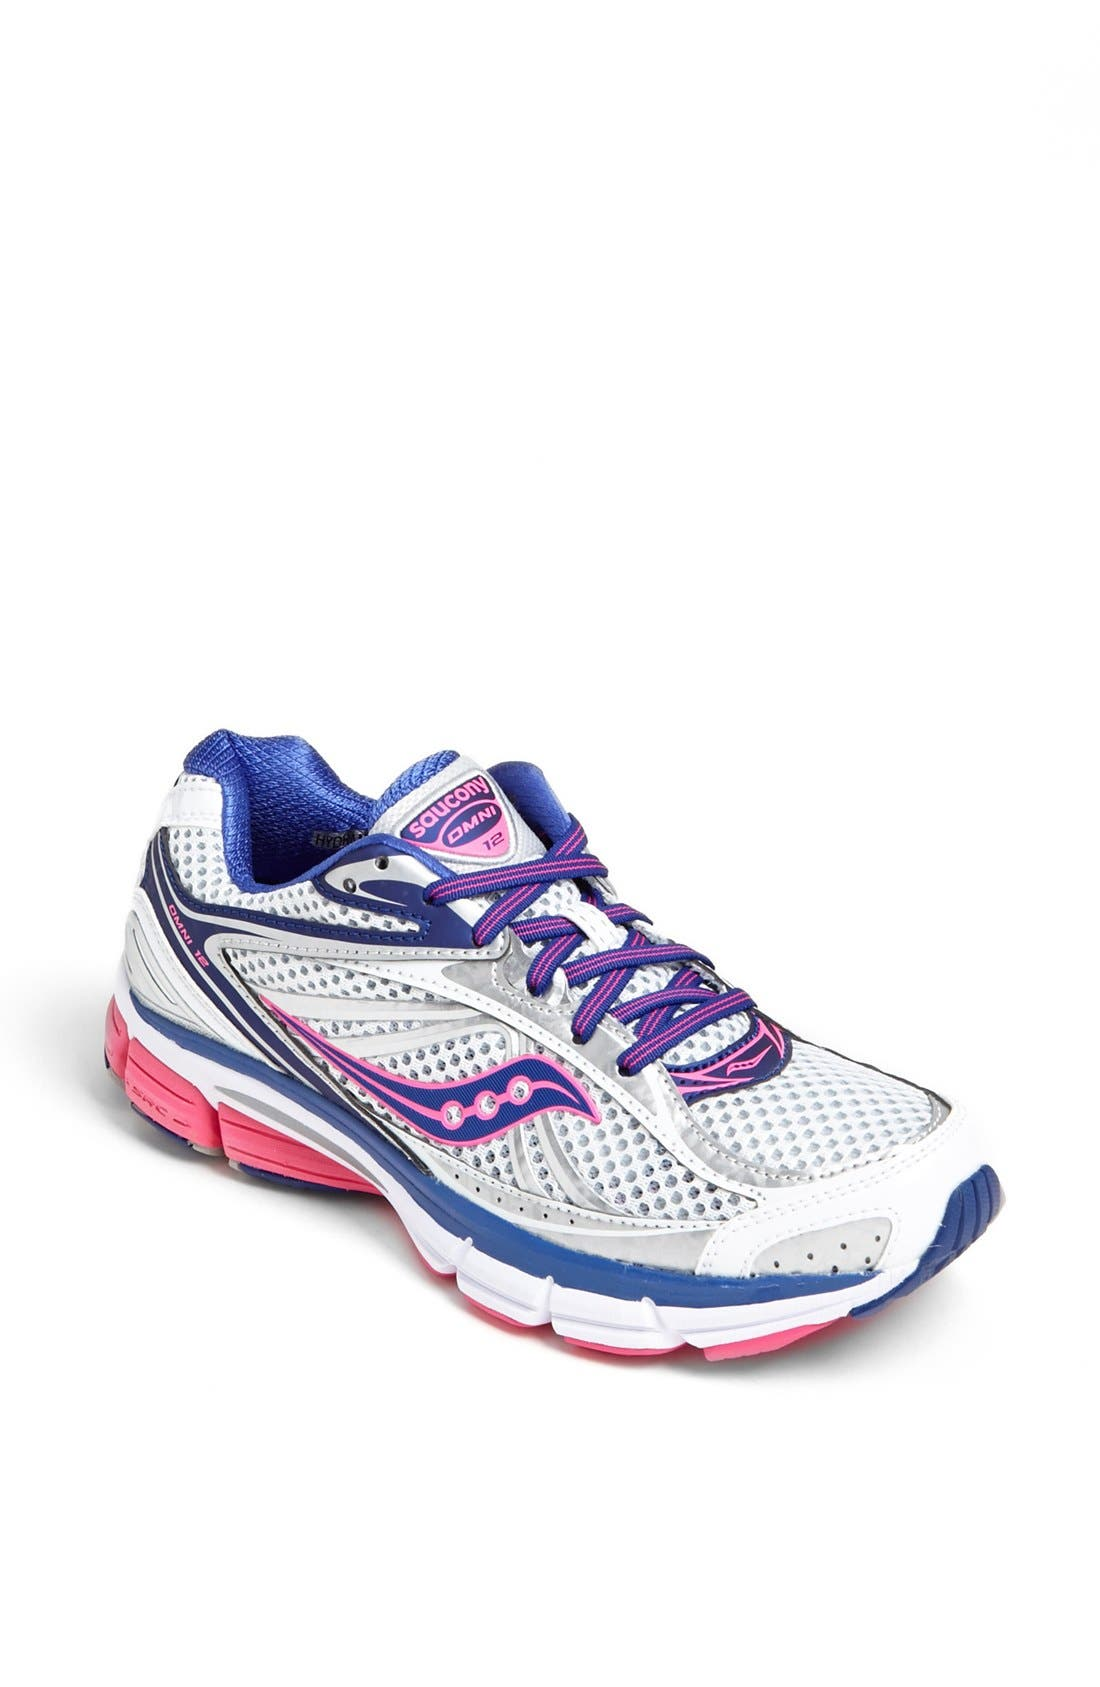 Alternate Image 1 Selected - Saucony 'Omni 12' Running Shoe (Women)